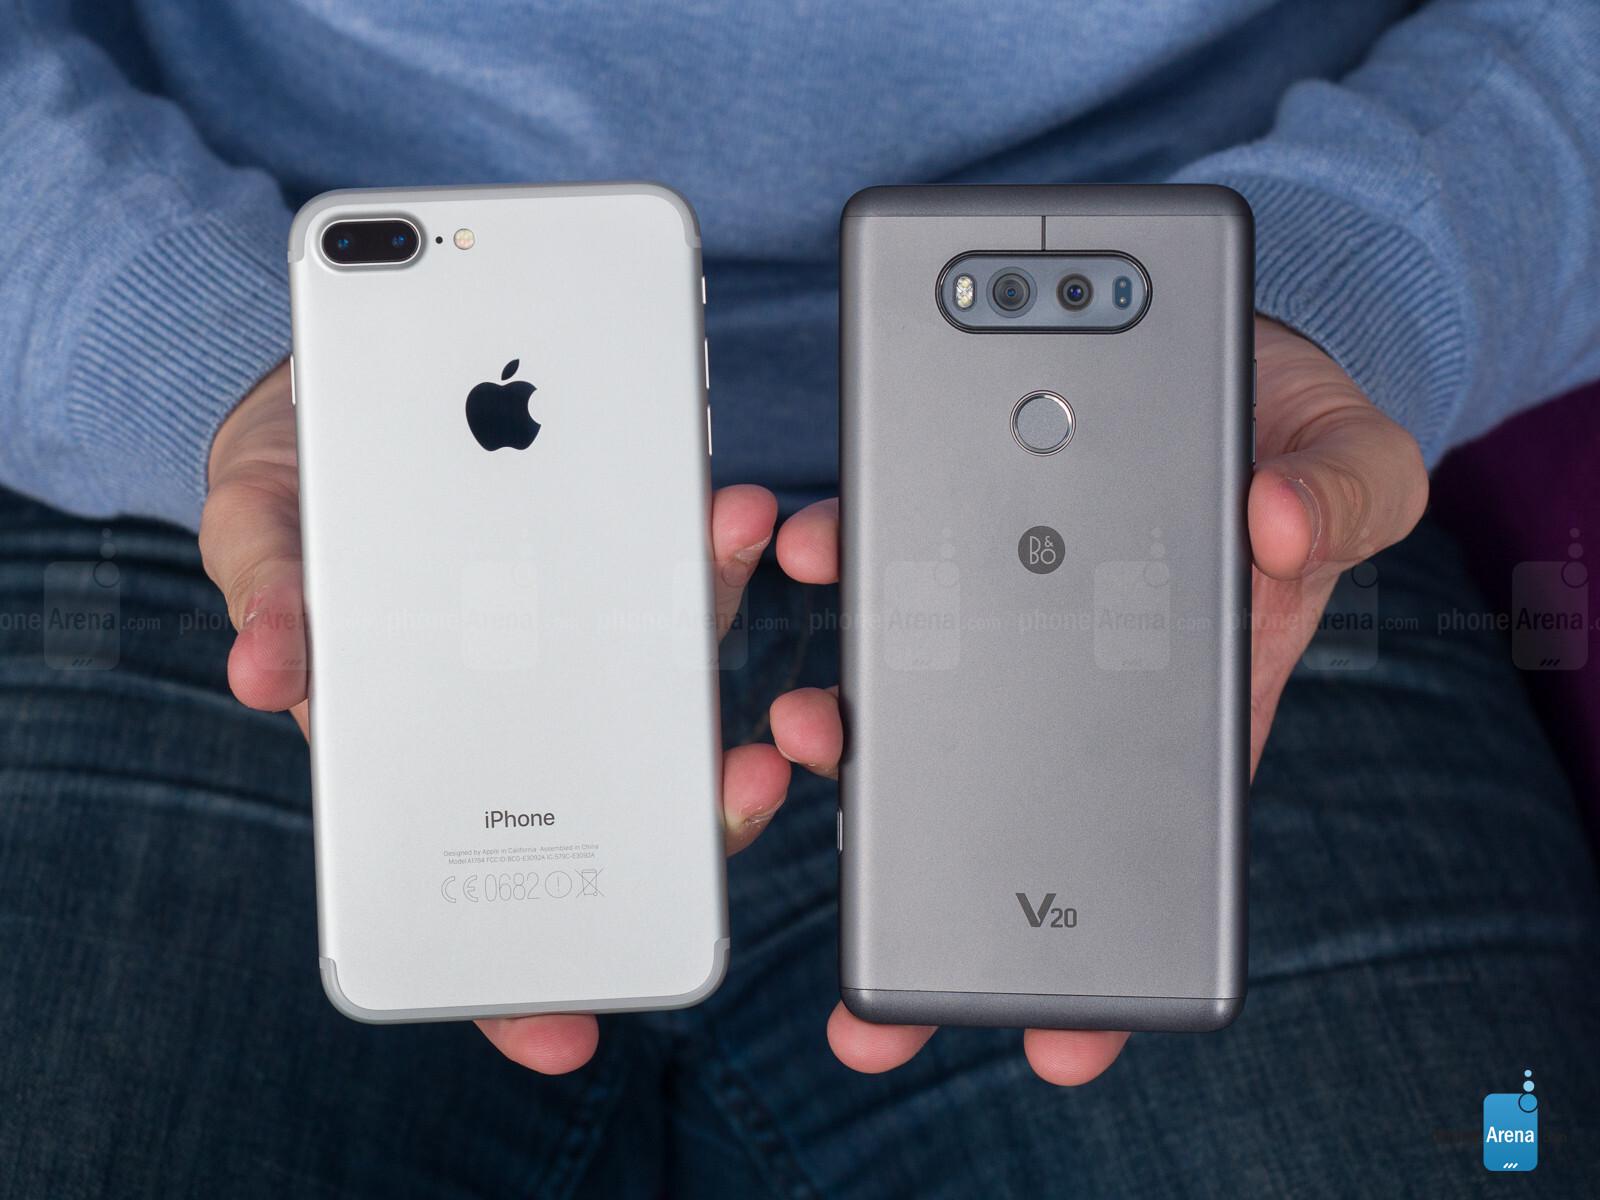 LG SMARTPHONE VS IPHONE